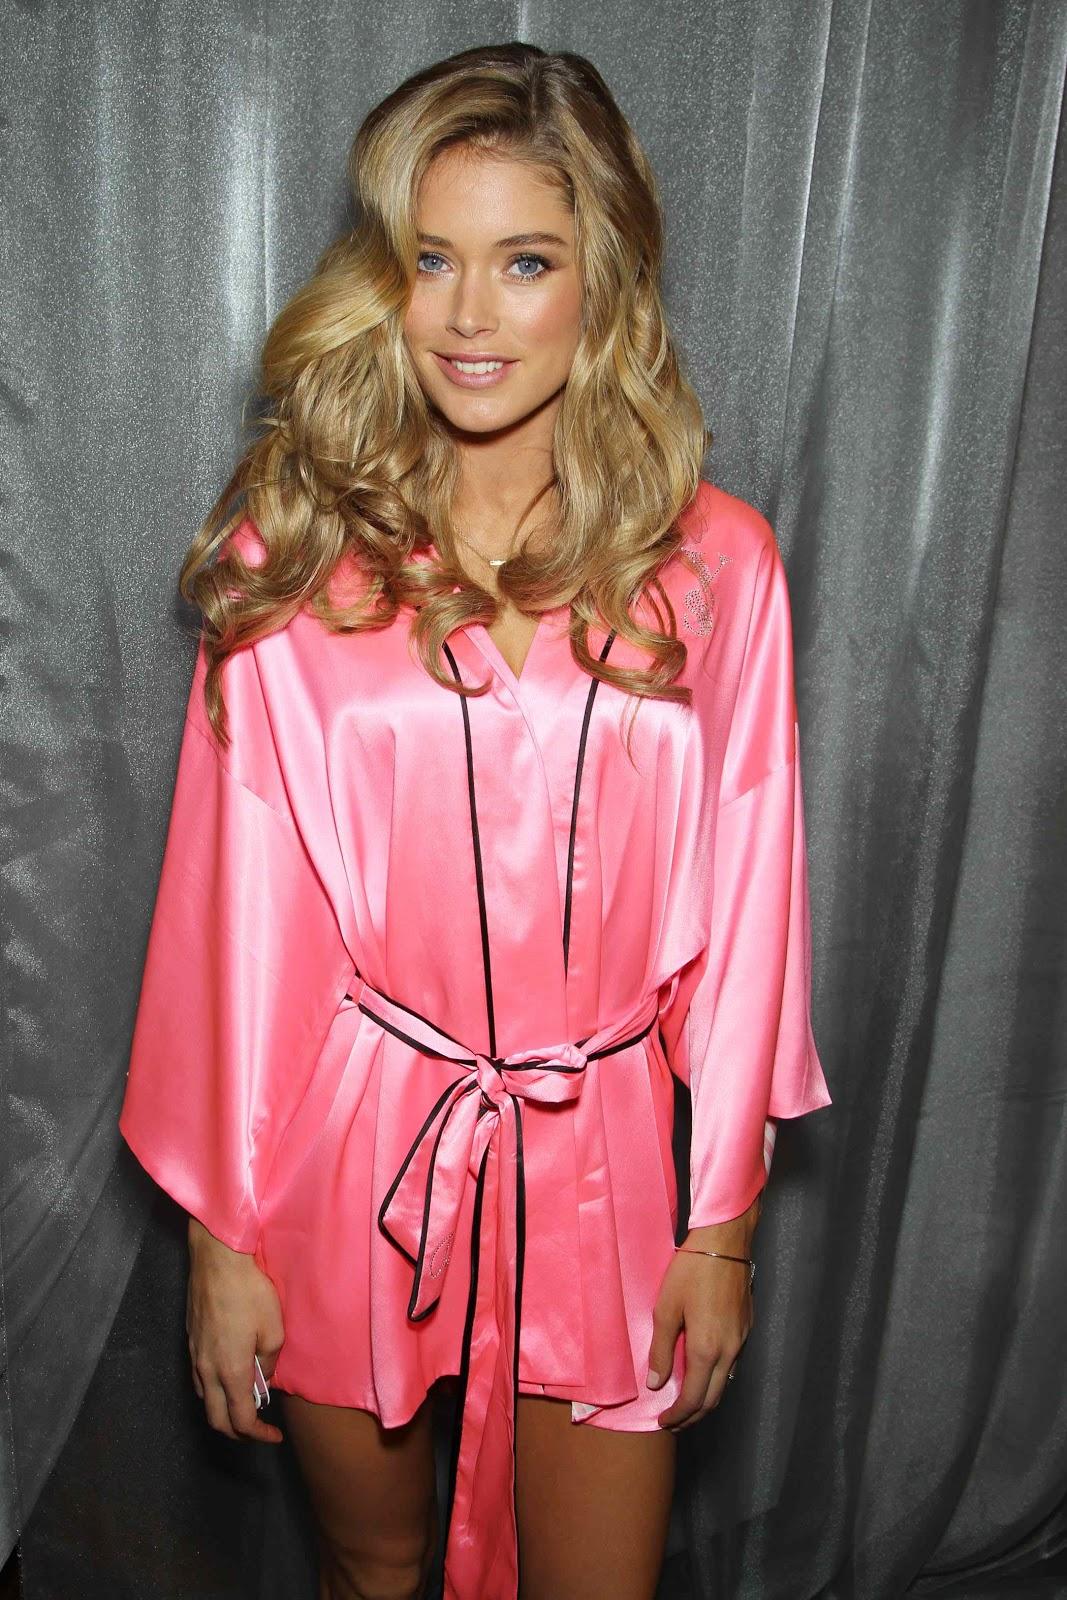 http://3.bp.blogspot.com/-G2OPryzRrIw/UNji-FFXqtI/AAAAAAABVK0/XlKFheVW4u4/s1600/Doutzen+Kroes+pink+robe+Victoria%27s+Secret+Fashion+Show07.jpg